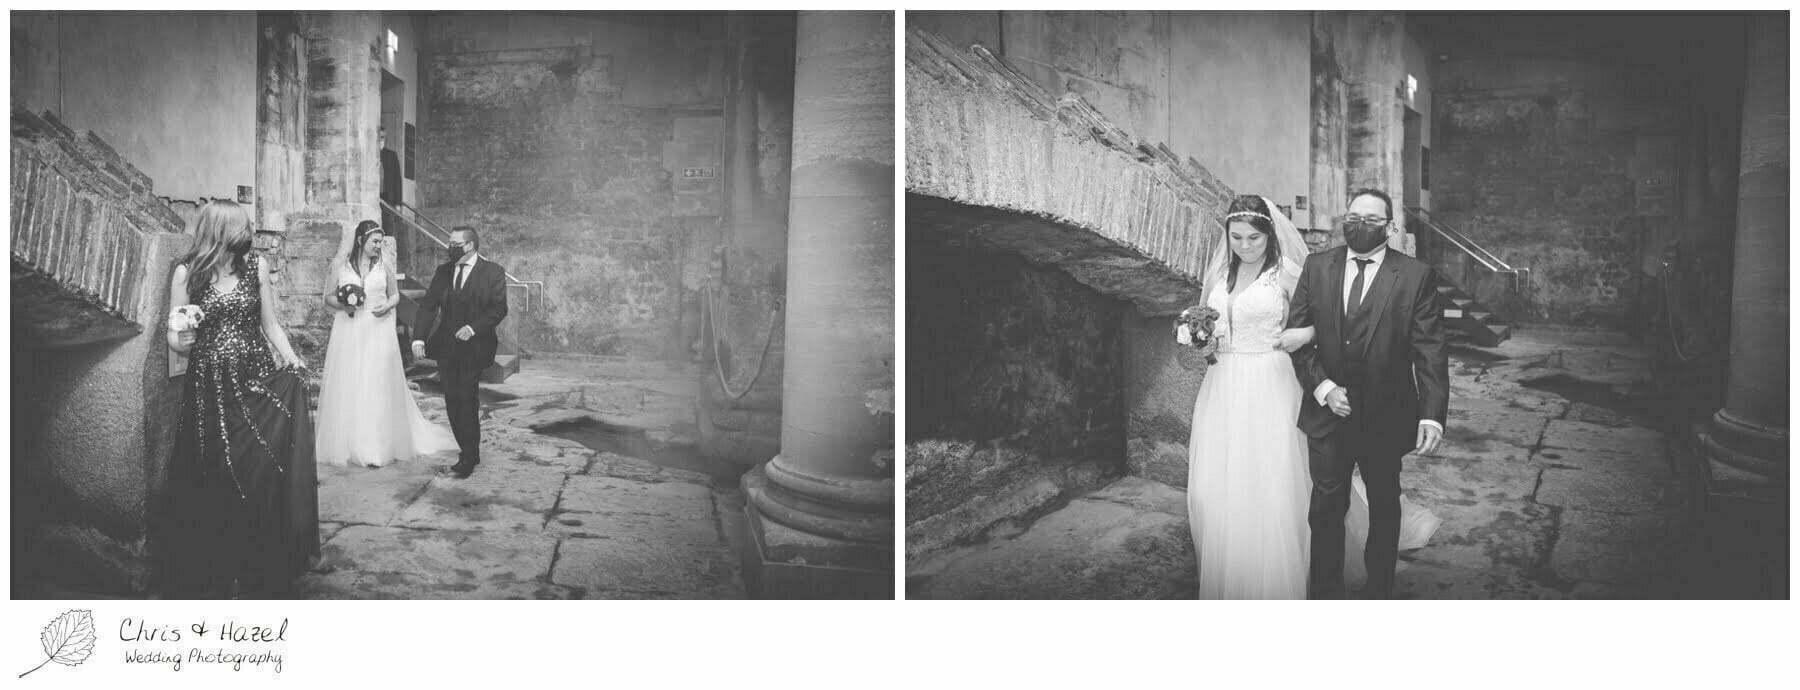 Bride walking down aisle Wedding Ceremony at Roman Baths Pump Rooms, The Roman Baths Wedding Photography, Roman Baths Wedding Photographer, Wedding in Bath, Bath Wedding Day, documentary wedding photography, Chris and Hazel Wedding Photography Bath, Sammie Singfield Scott Brown